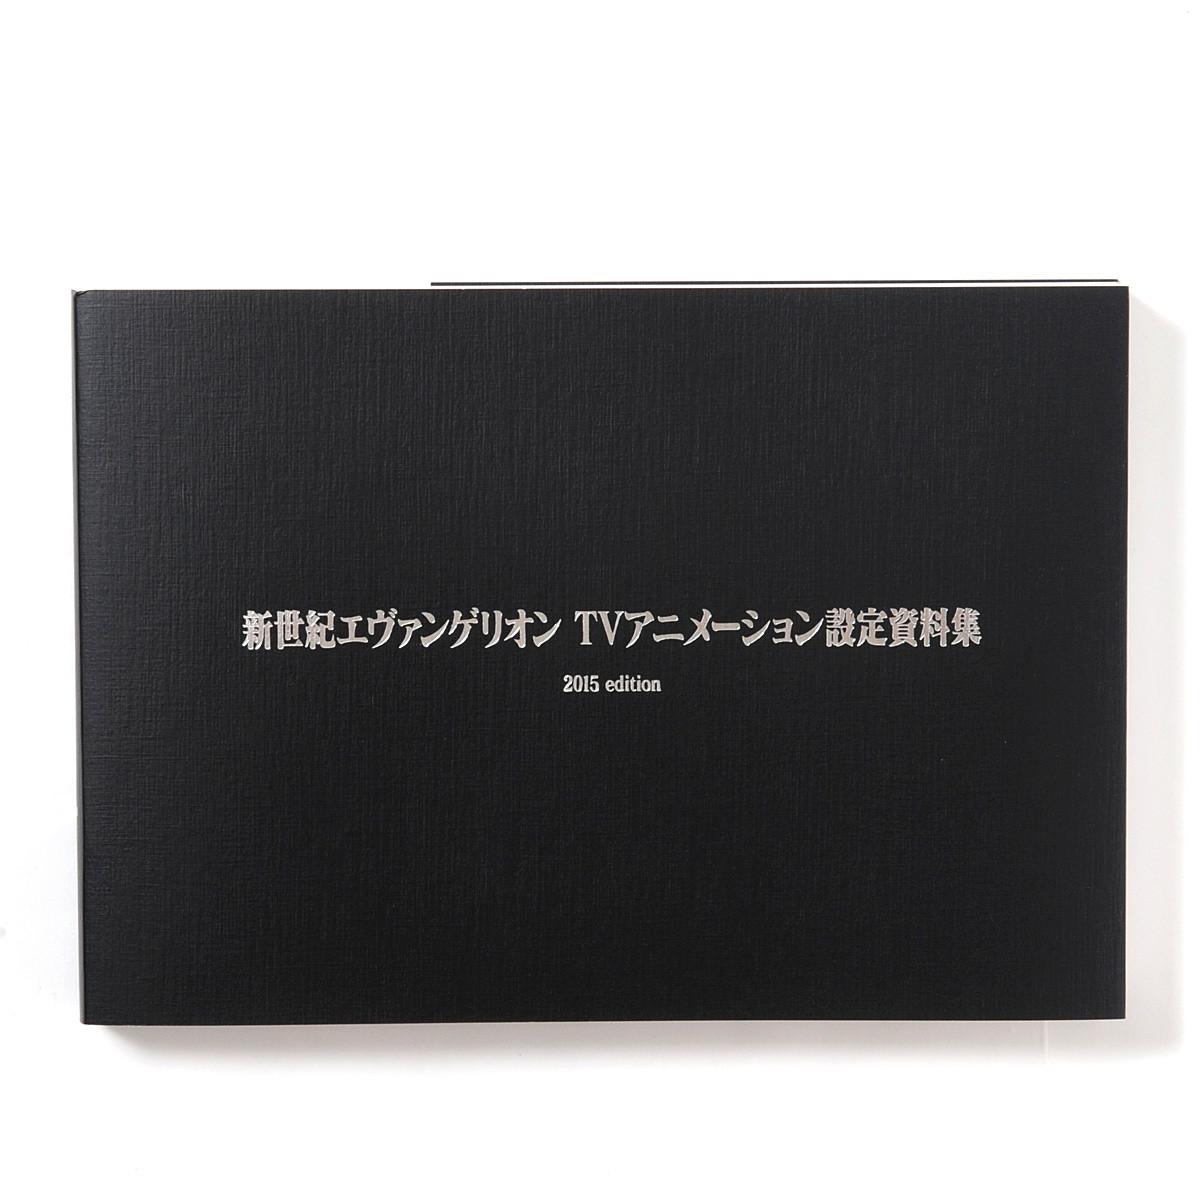 Neon Genesis Evangelion Tv Animation Production Art